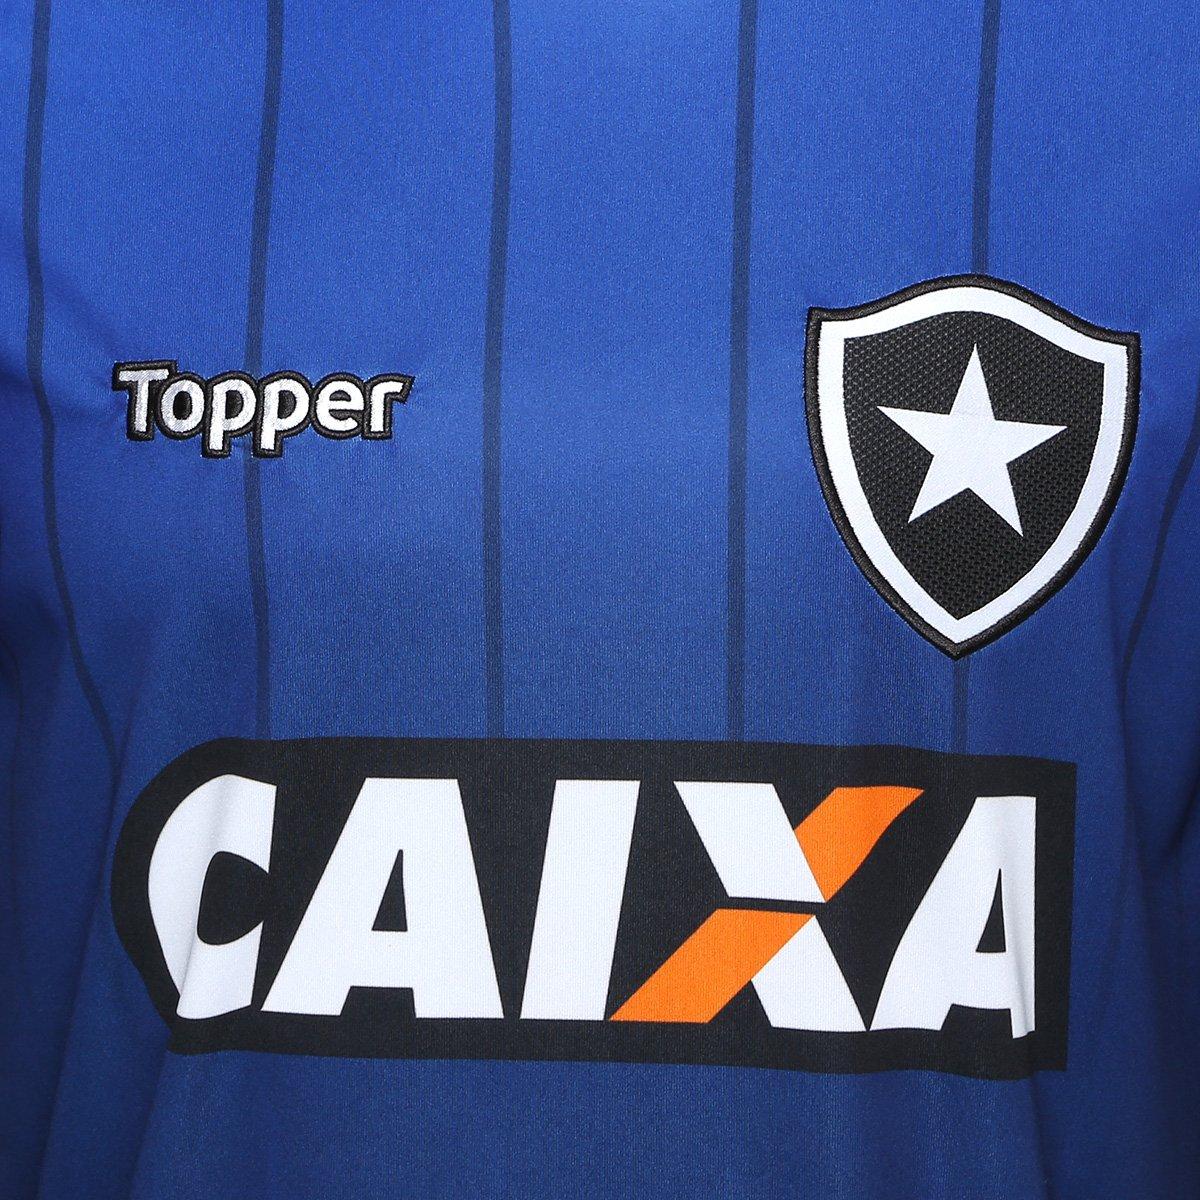 Camisa Botafogo Treino Atleta Topper Masculina - Azul e Preto ... 869e8d8956ad2